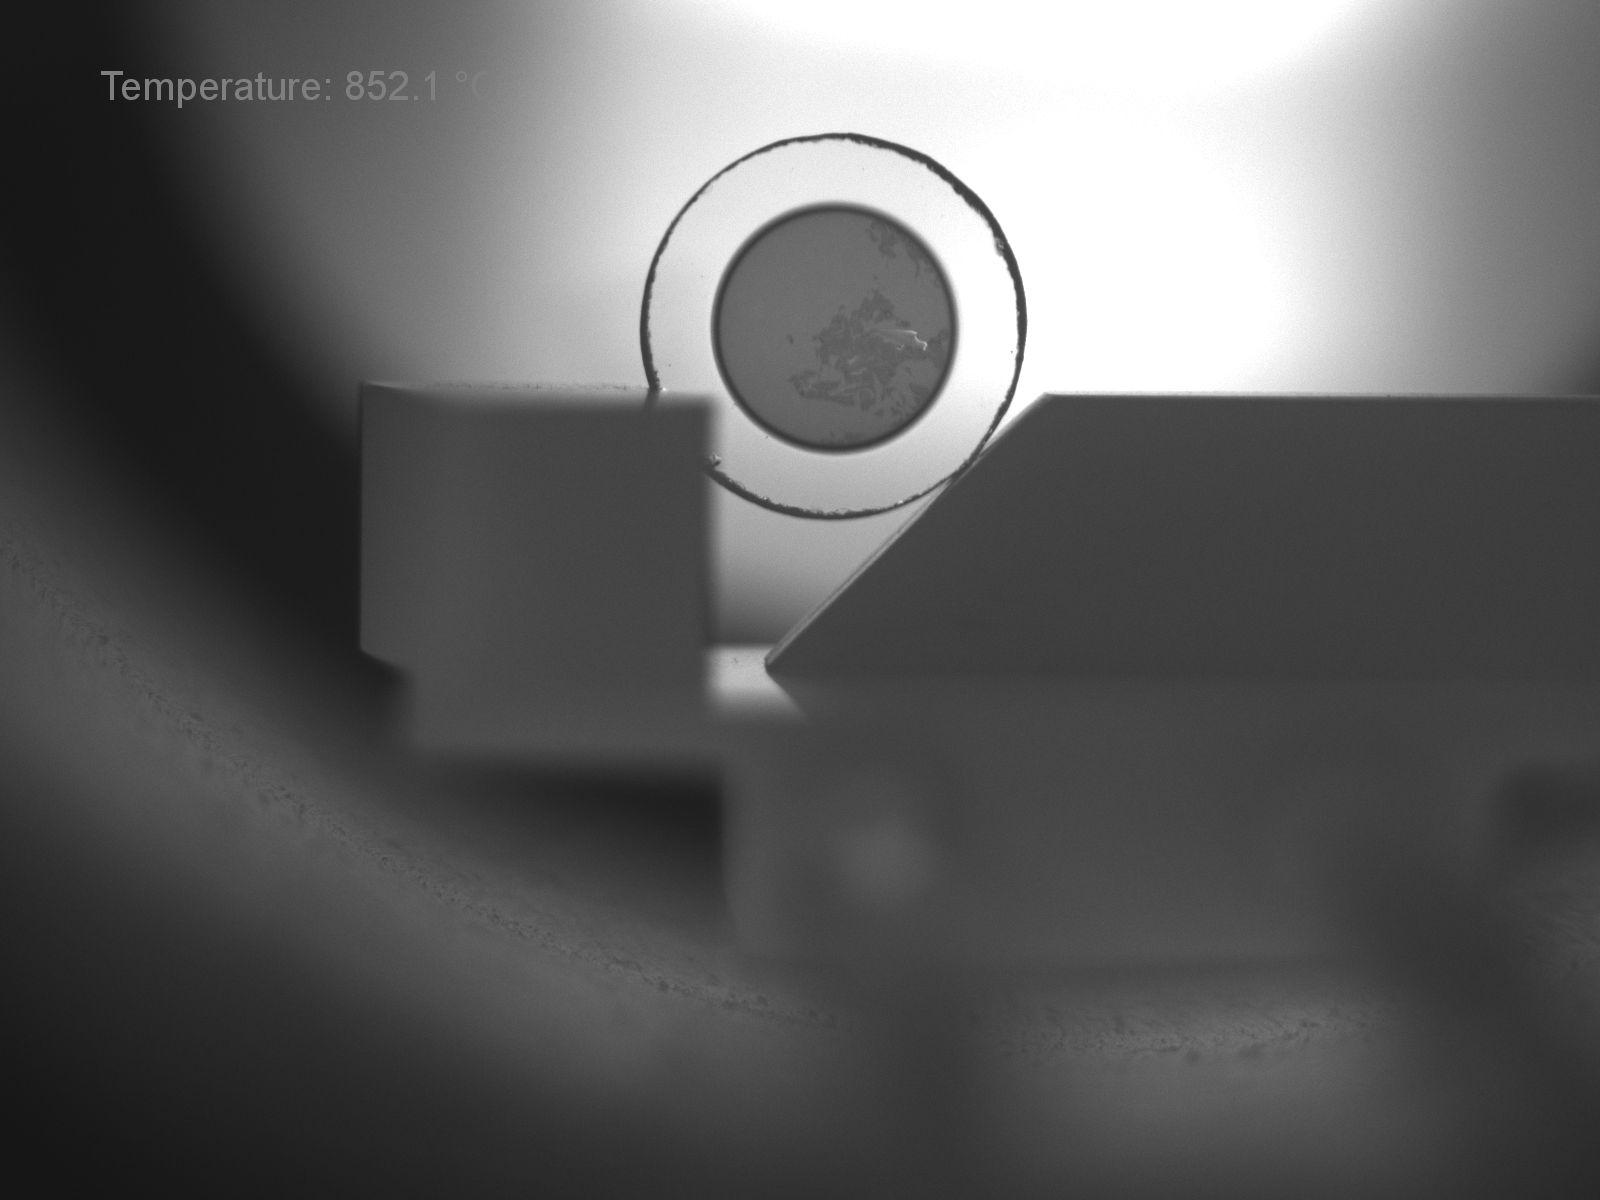 Hochtemperaturmikroskopie